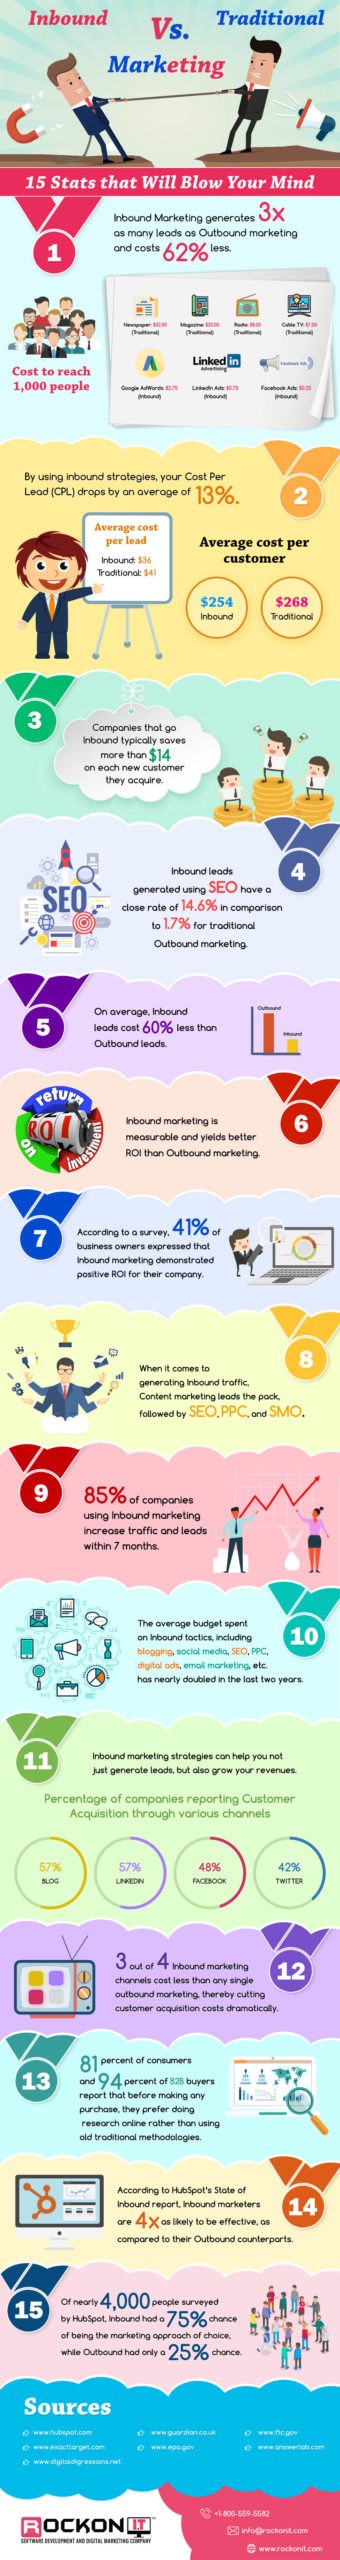 inbound marketing vs traditional marketing